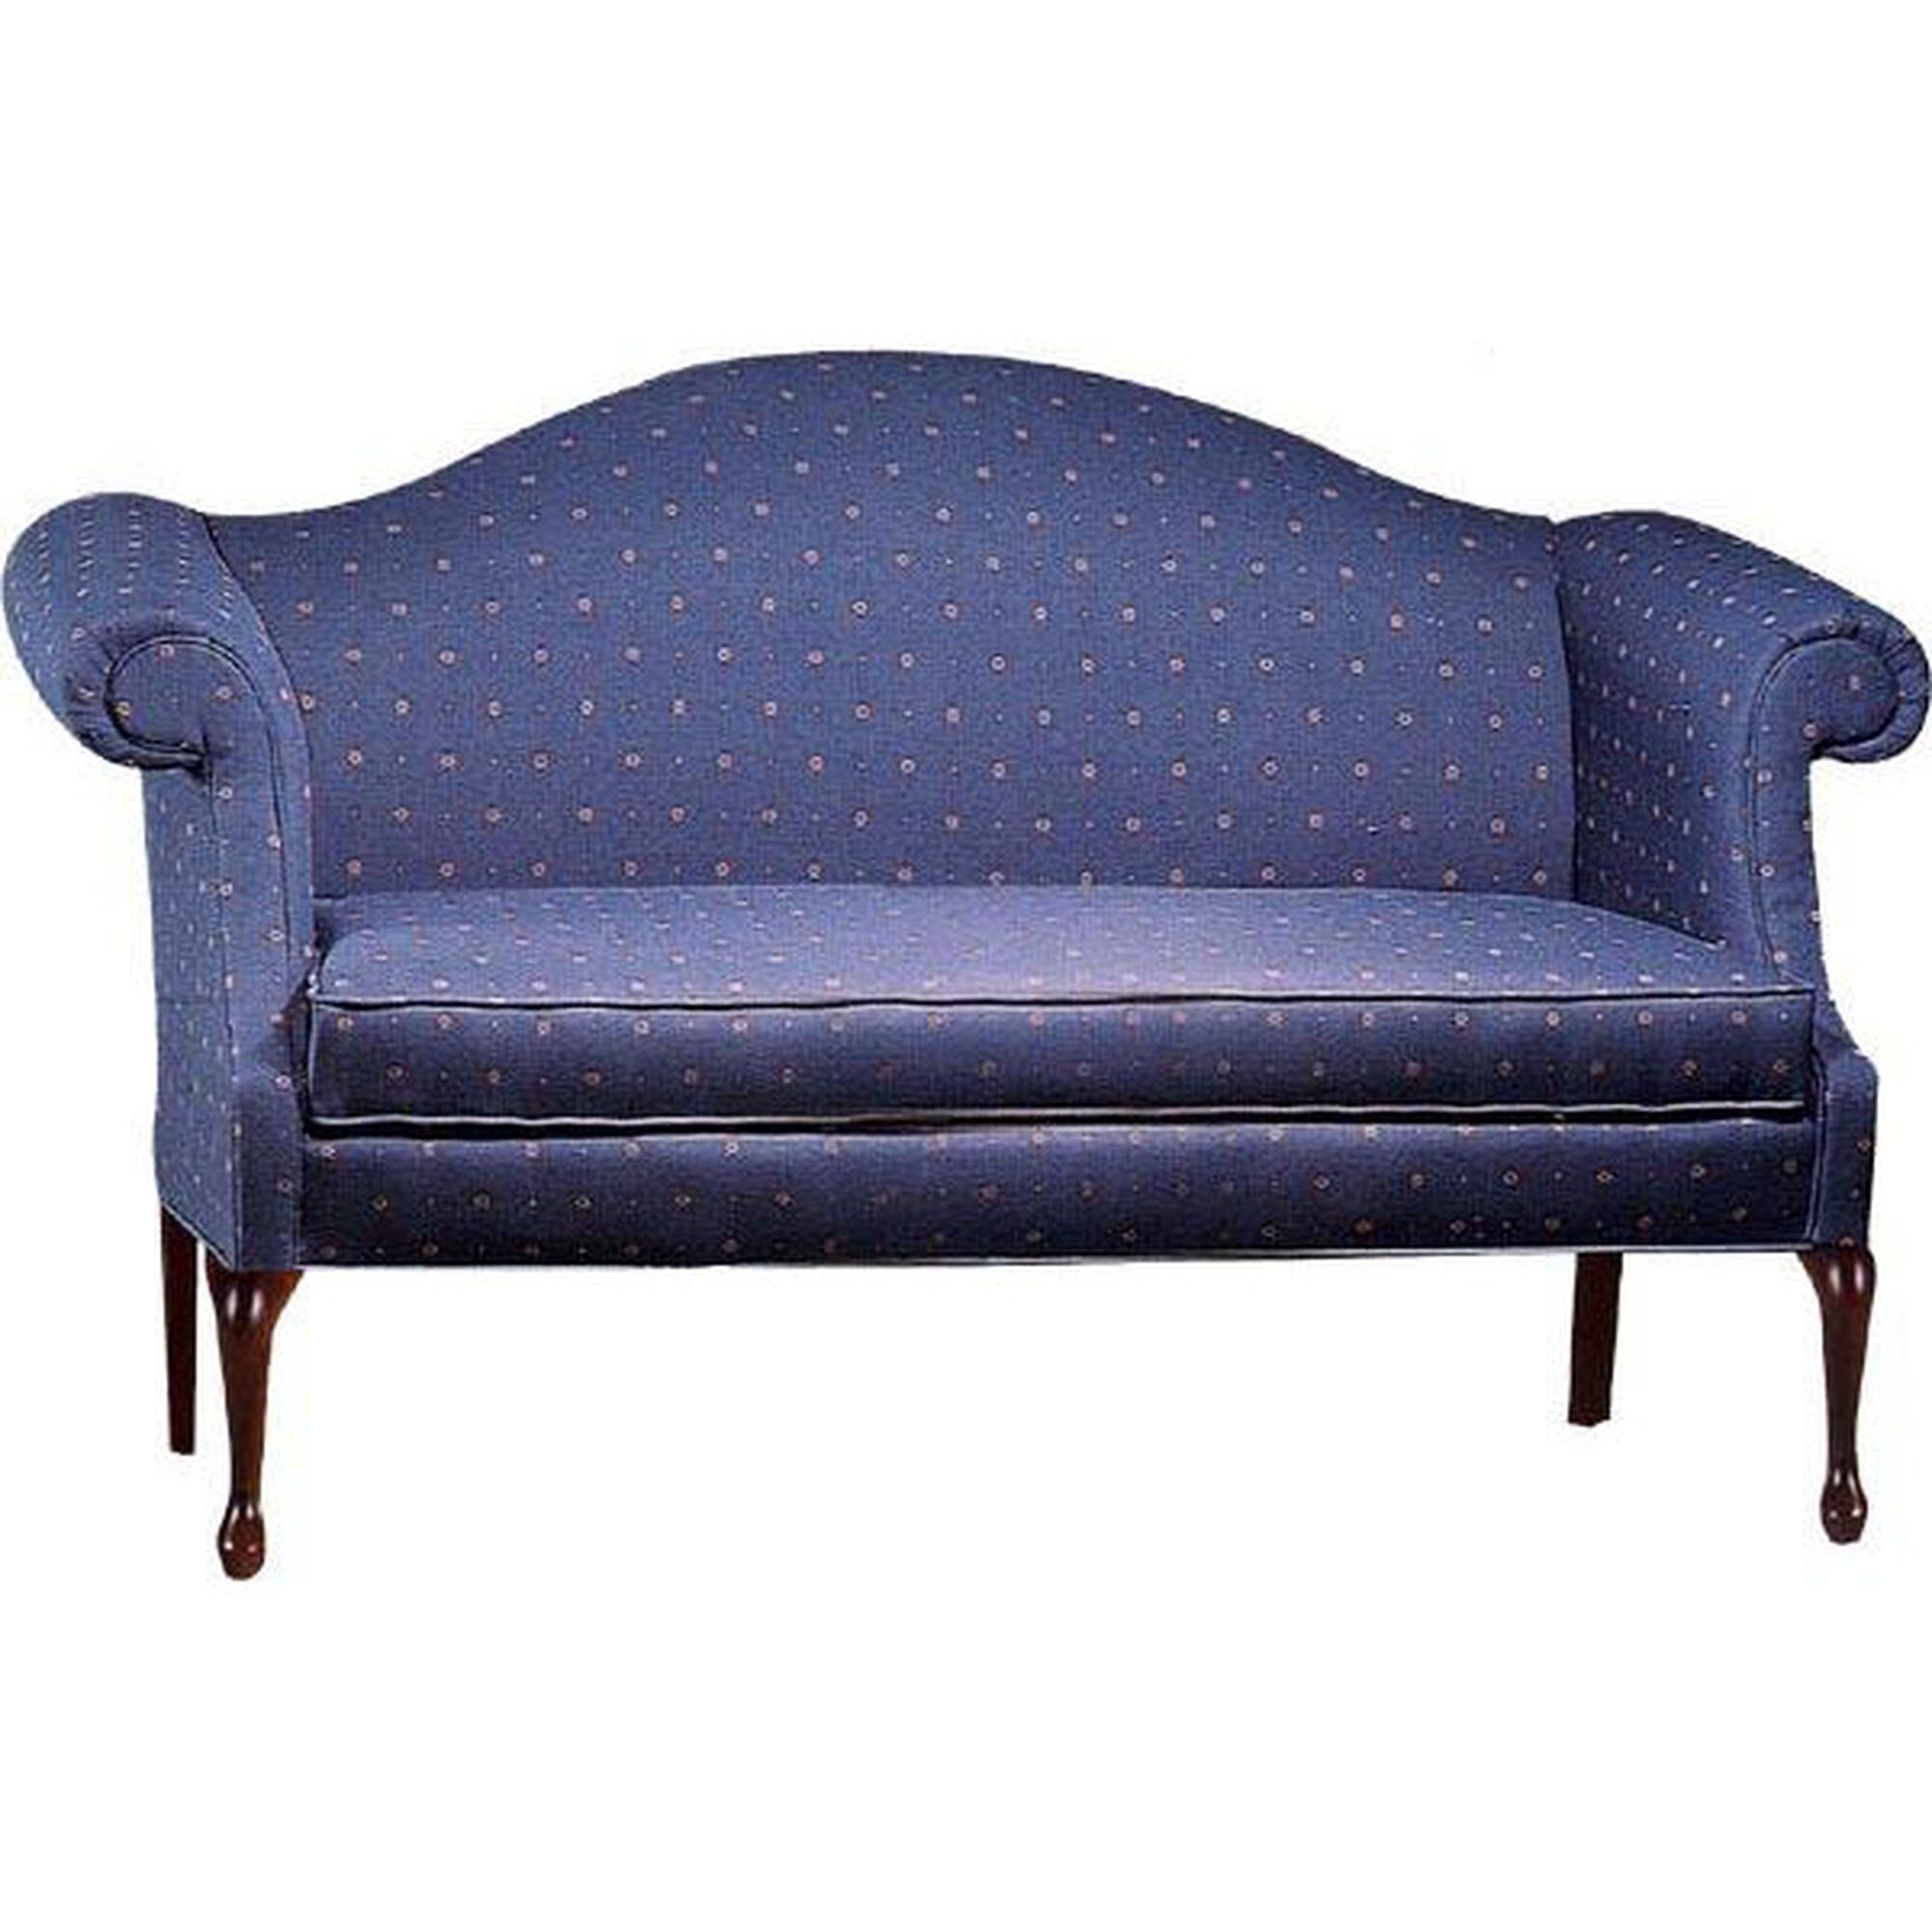 Ac furniture 14210 loveseat w queen anne legs grade 1 for Furniture sites